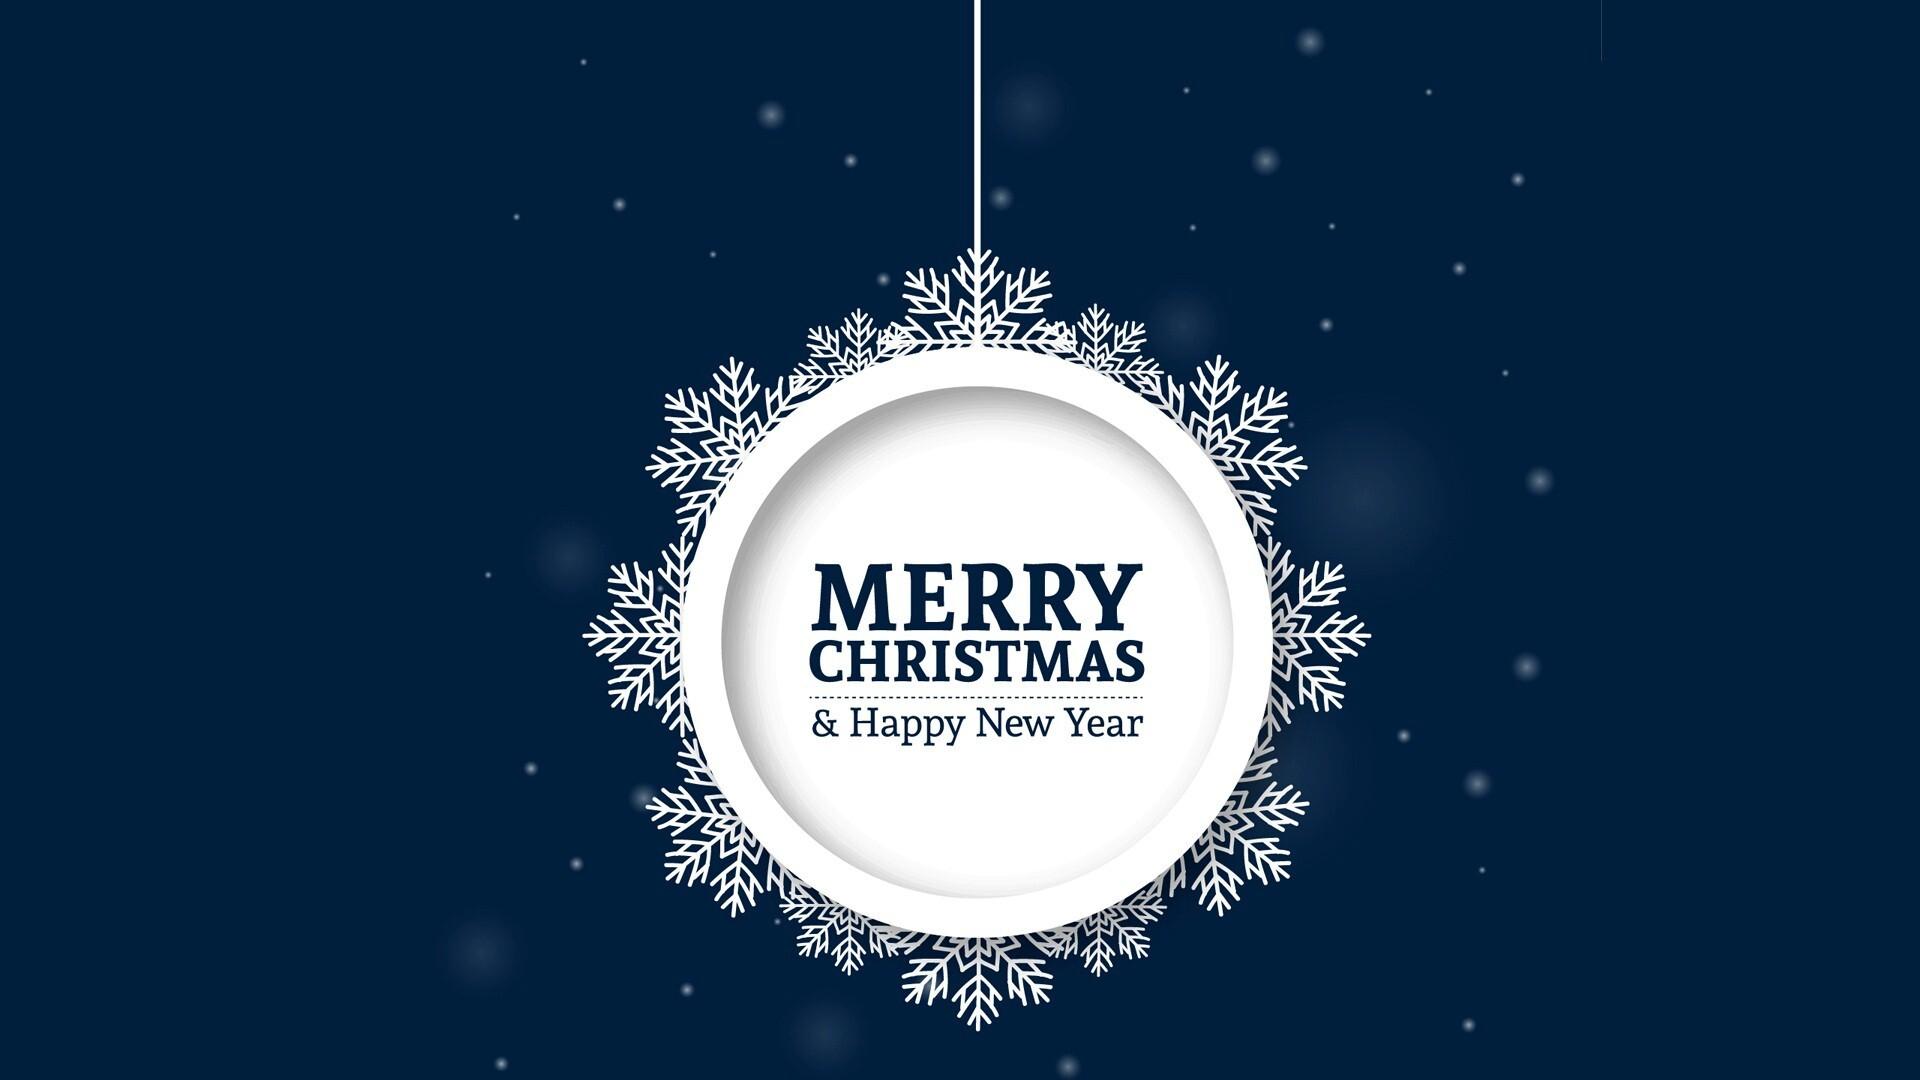 merry christmas 2016 hd desktop background wallpapers | hd wallpapers